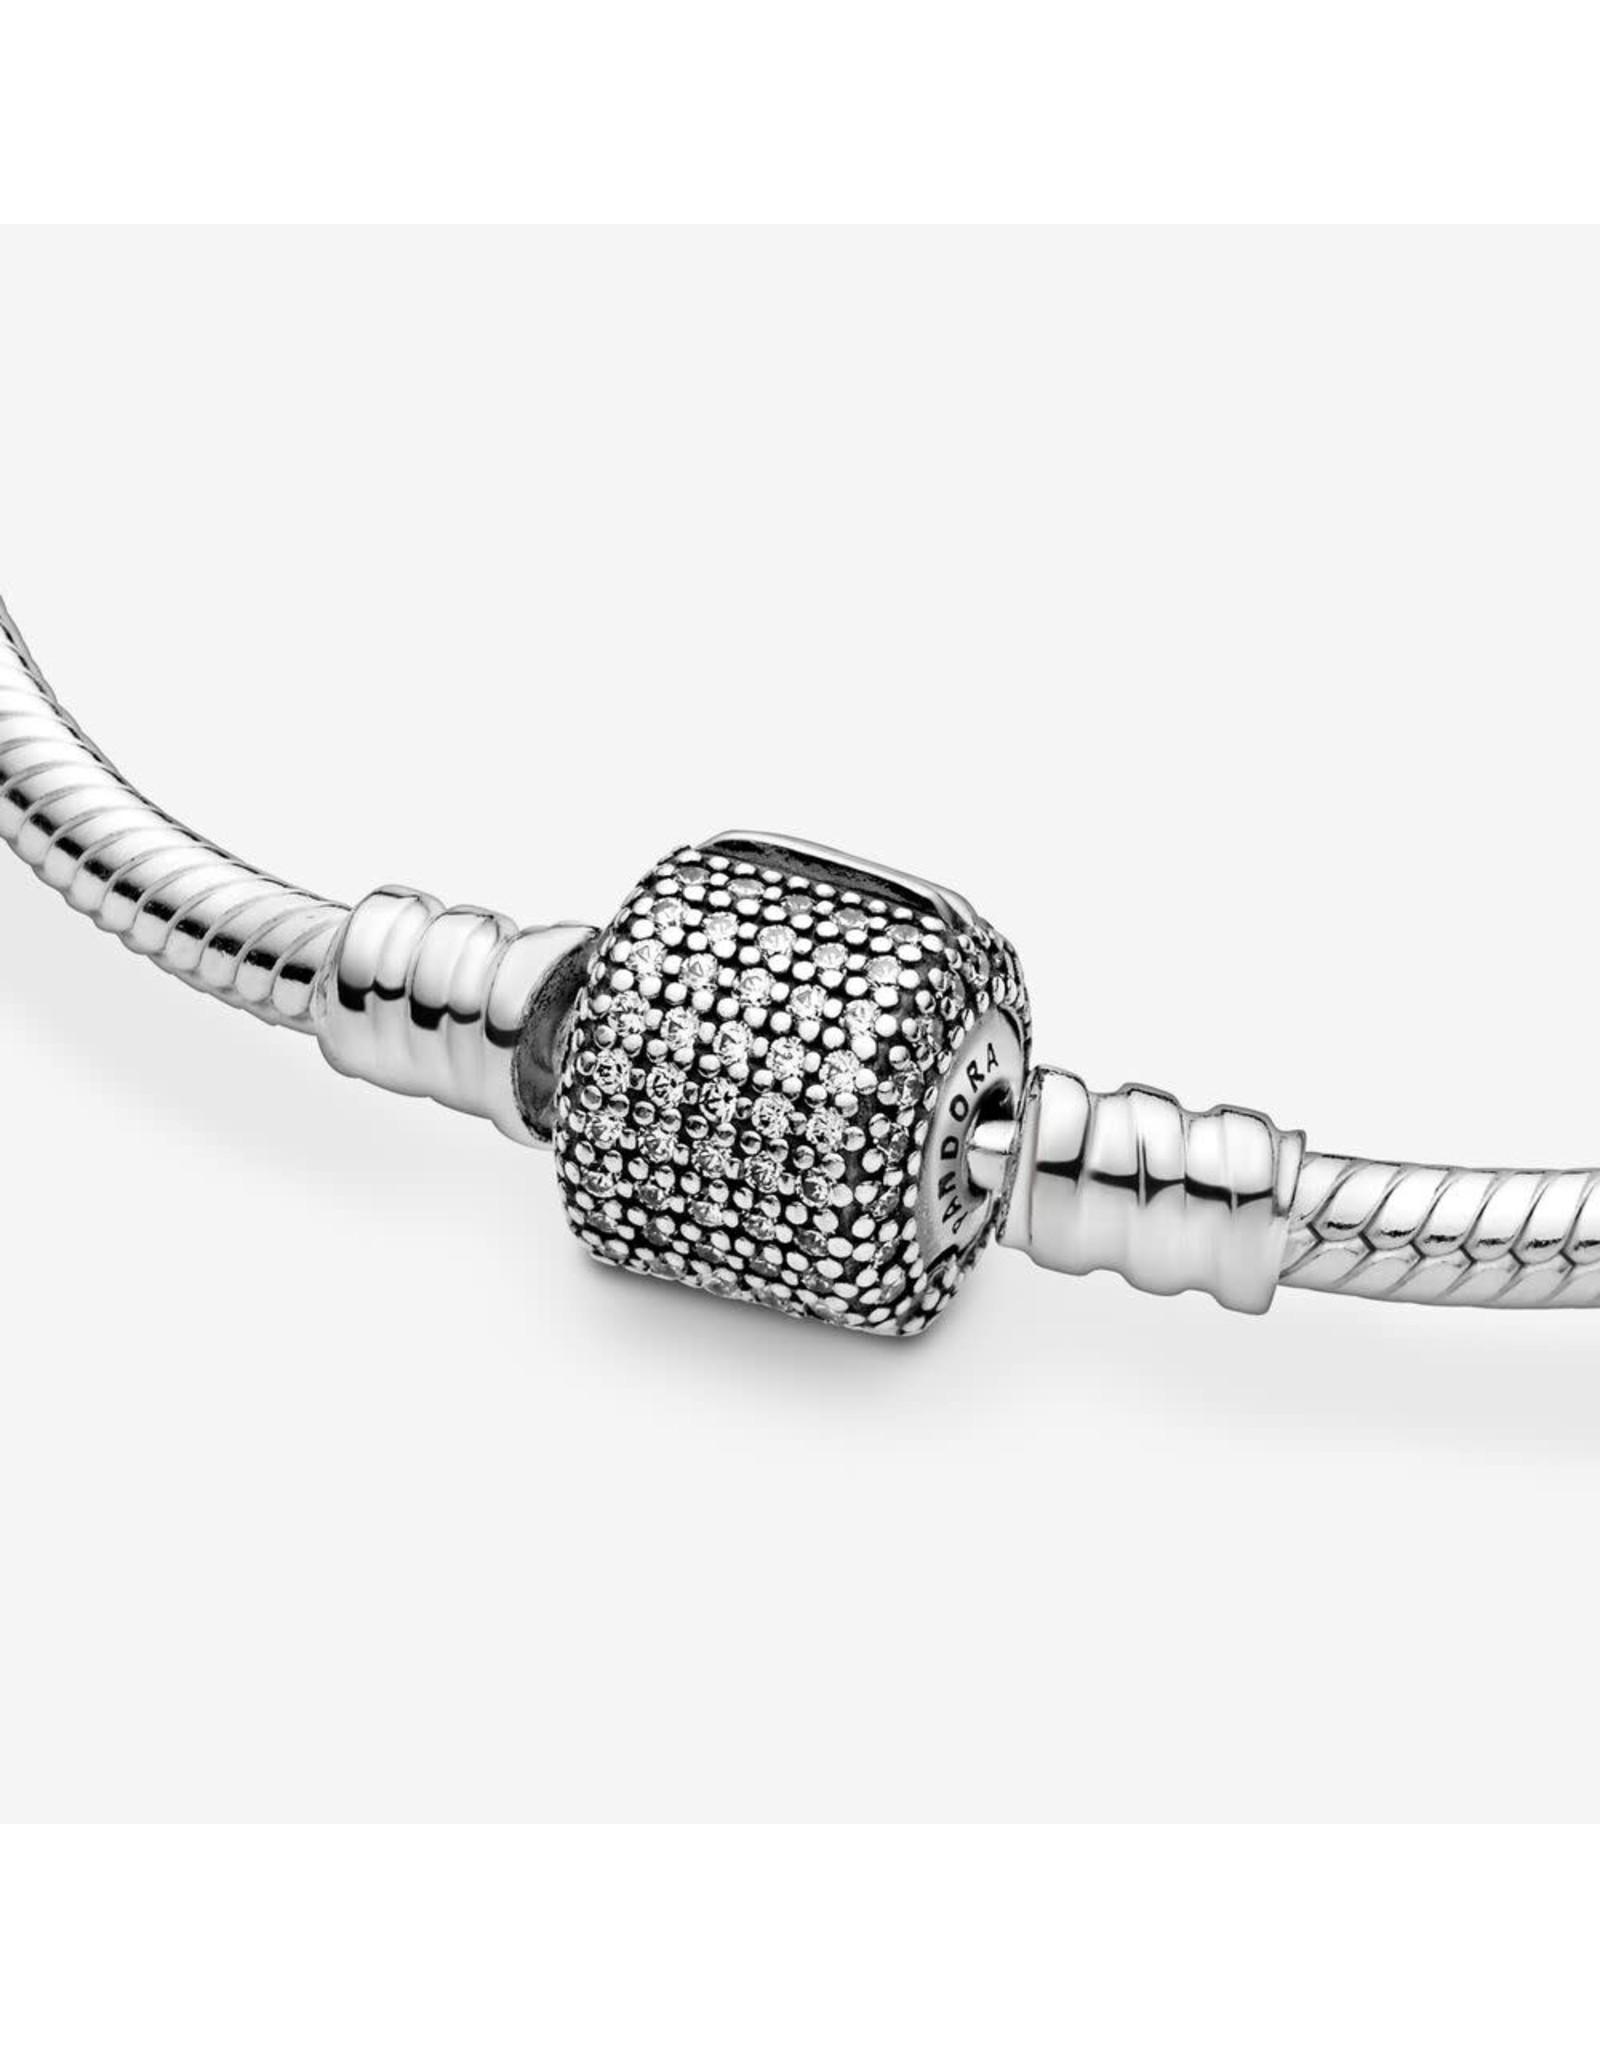 Pandora Pandora Moments Sparkling Pavé Clasp Snake Chain Bracelet Sterling Silver Cubic Zirconia